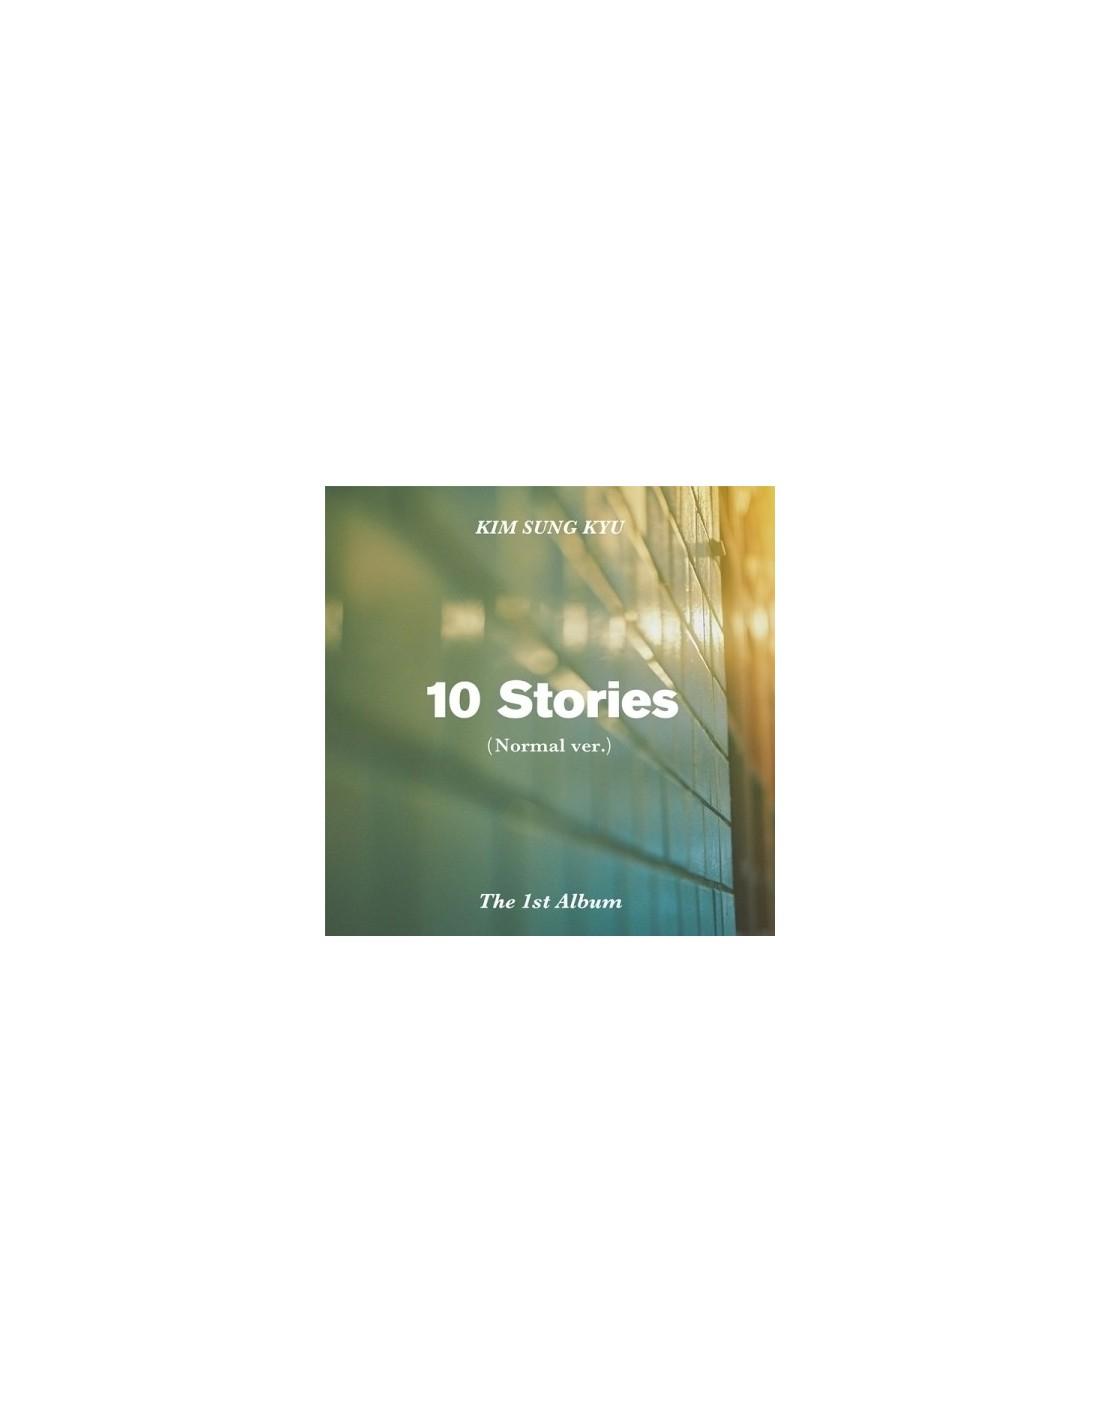 Kim Sung Kyu 1st Album 10 Stories Nomal Ver Cd Poster